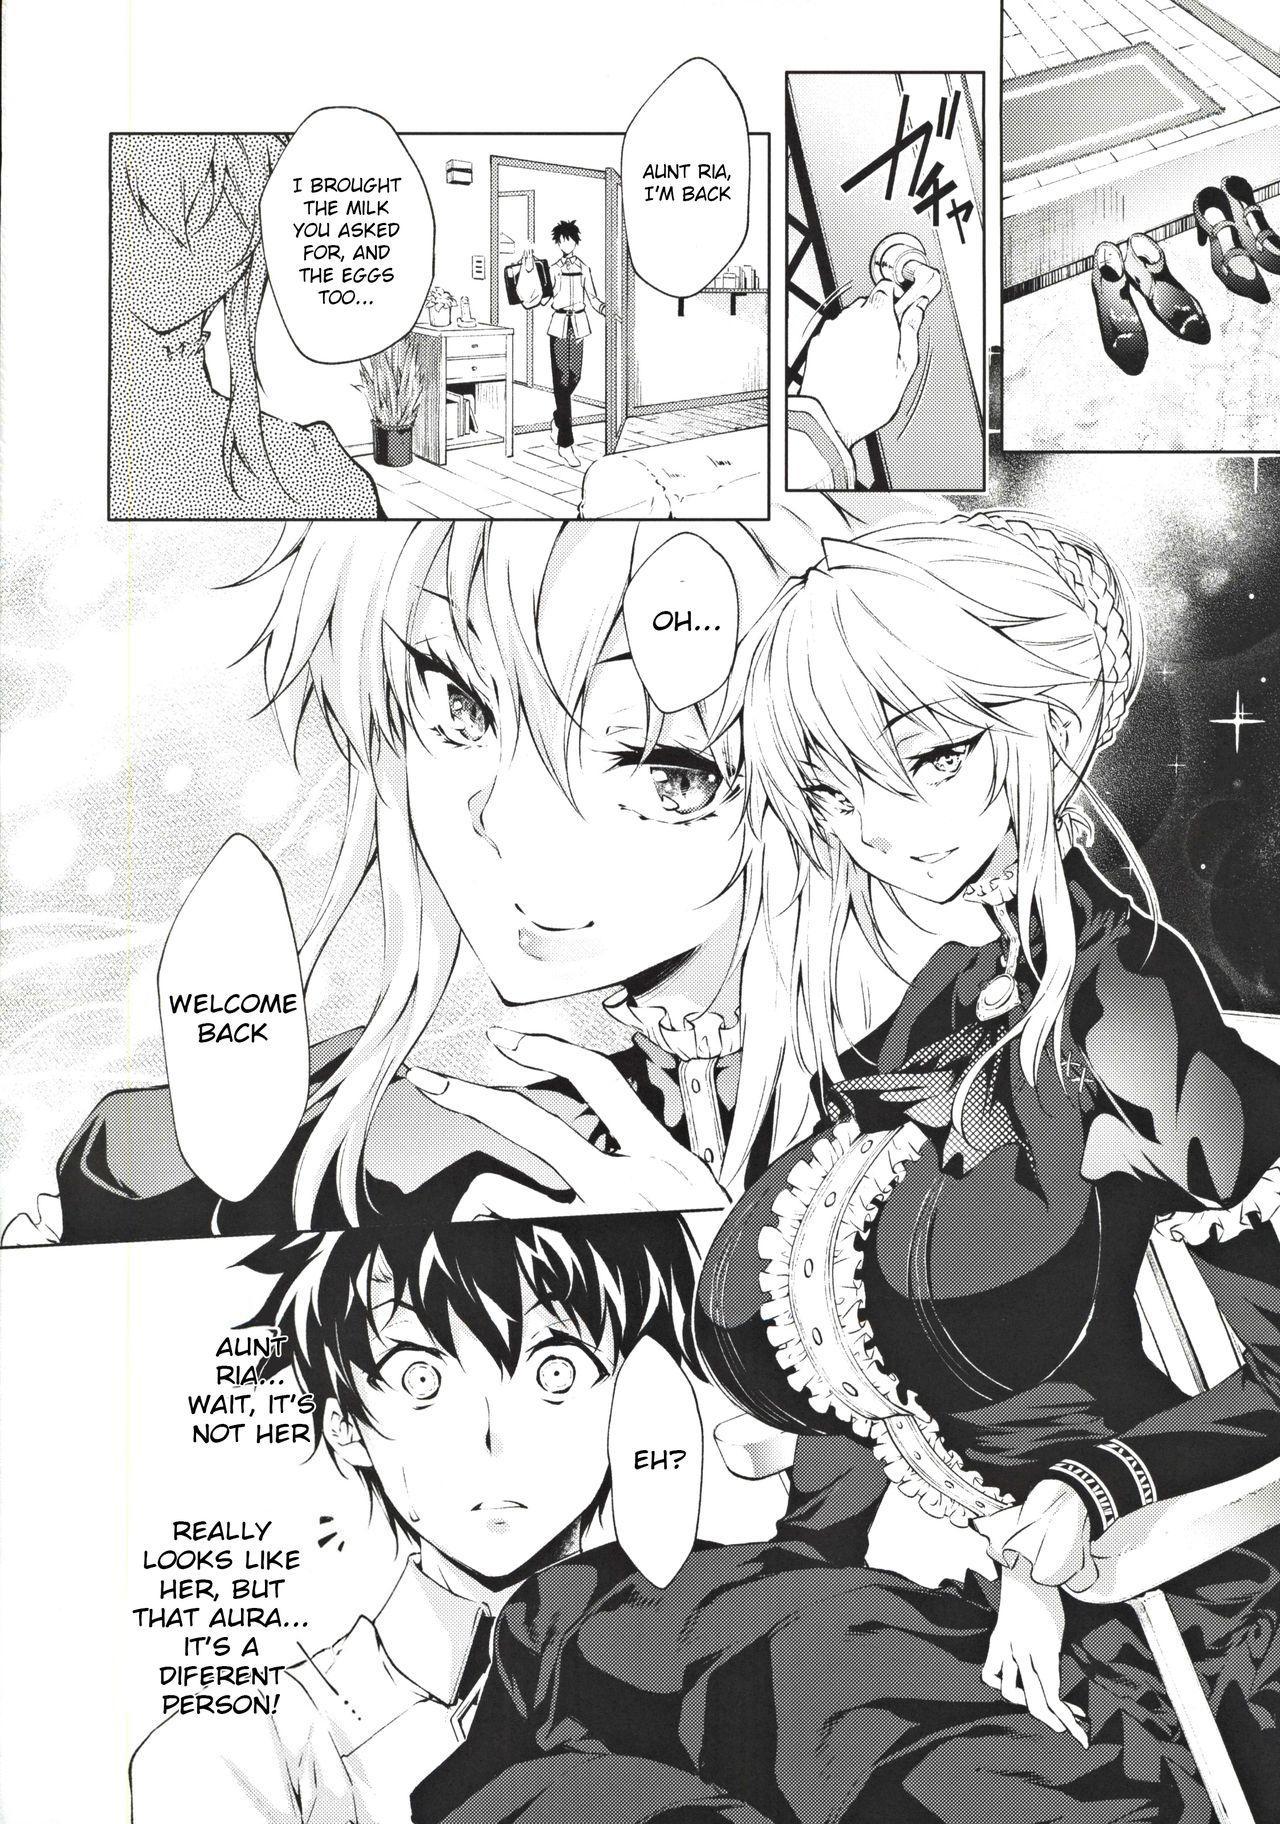 Pendra Shimai no Seijijou   The Pendragon twin sisters' sexual situation 2